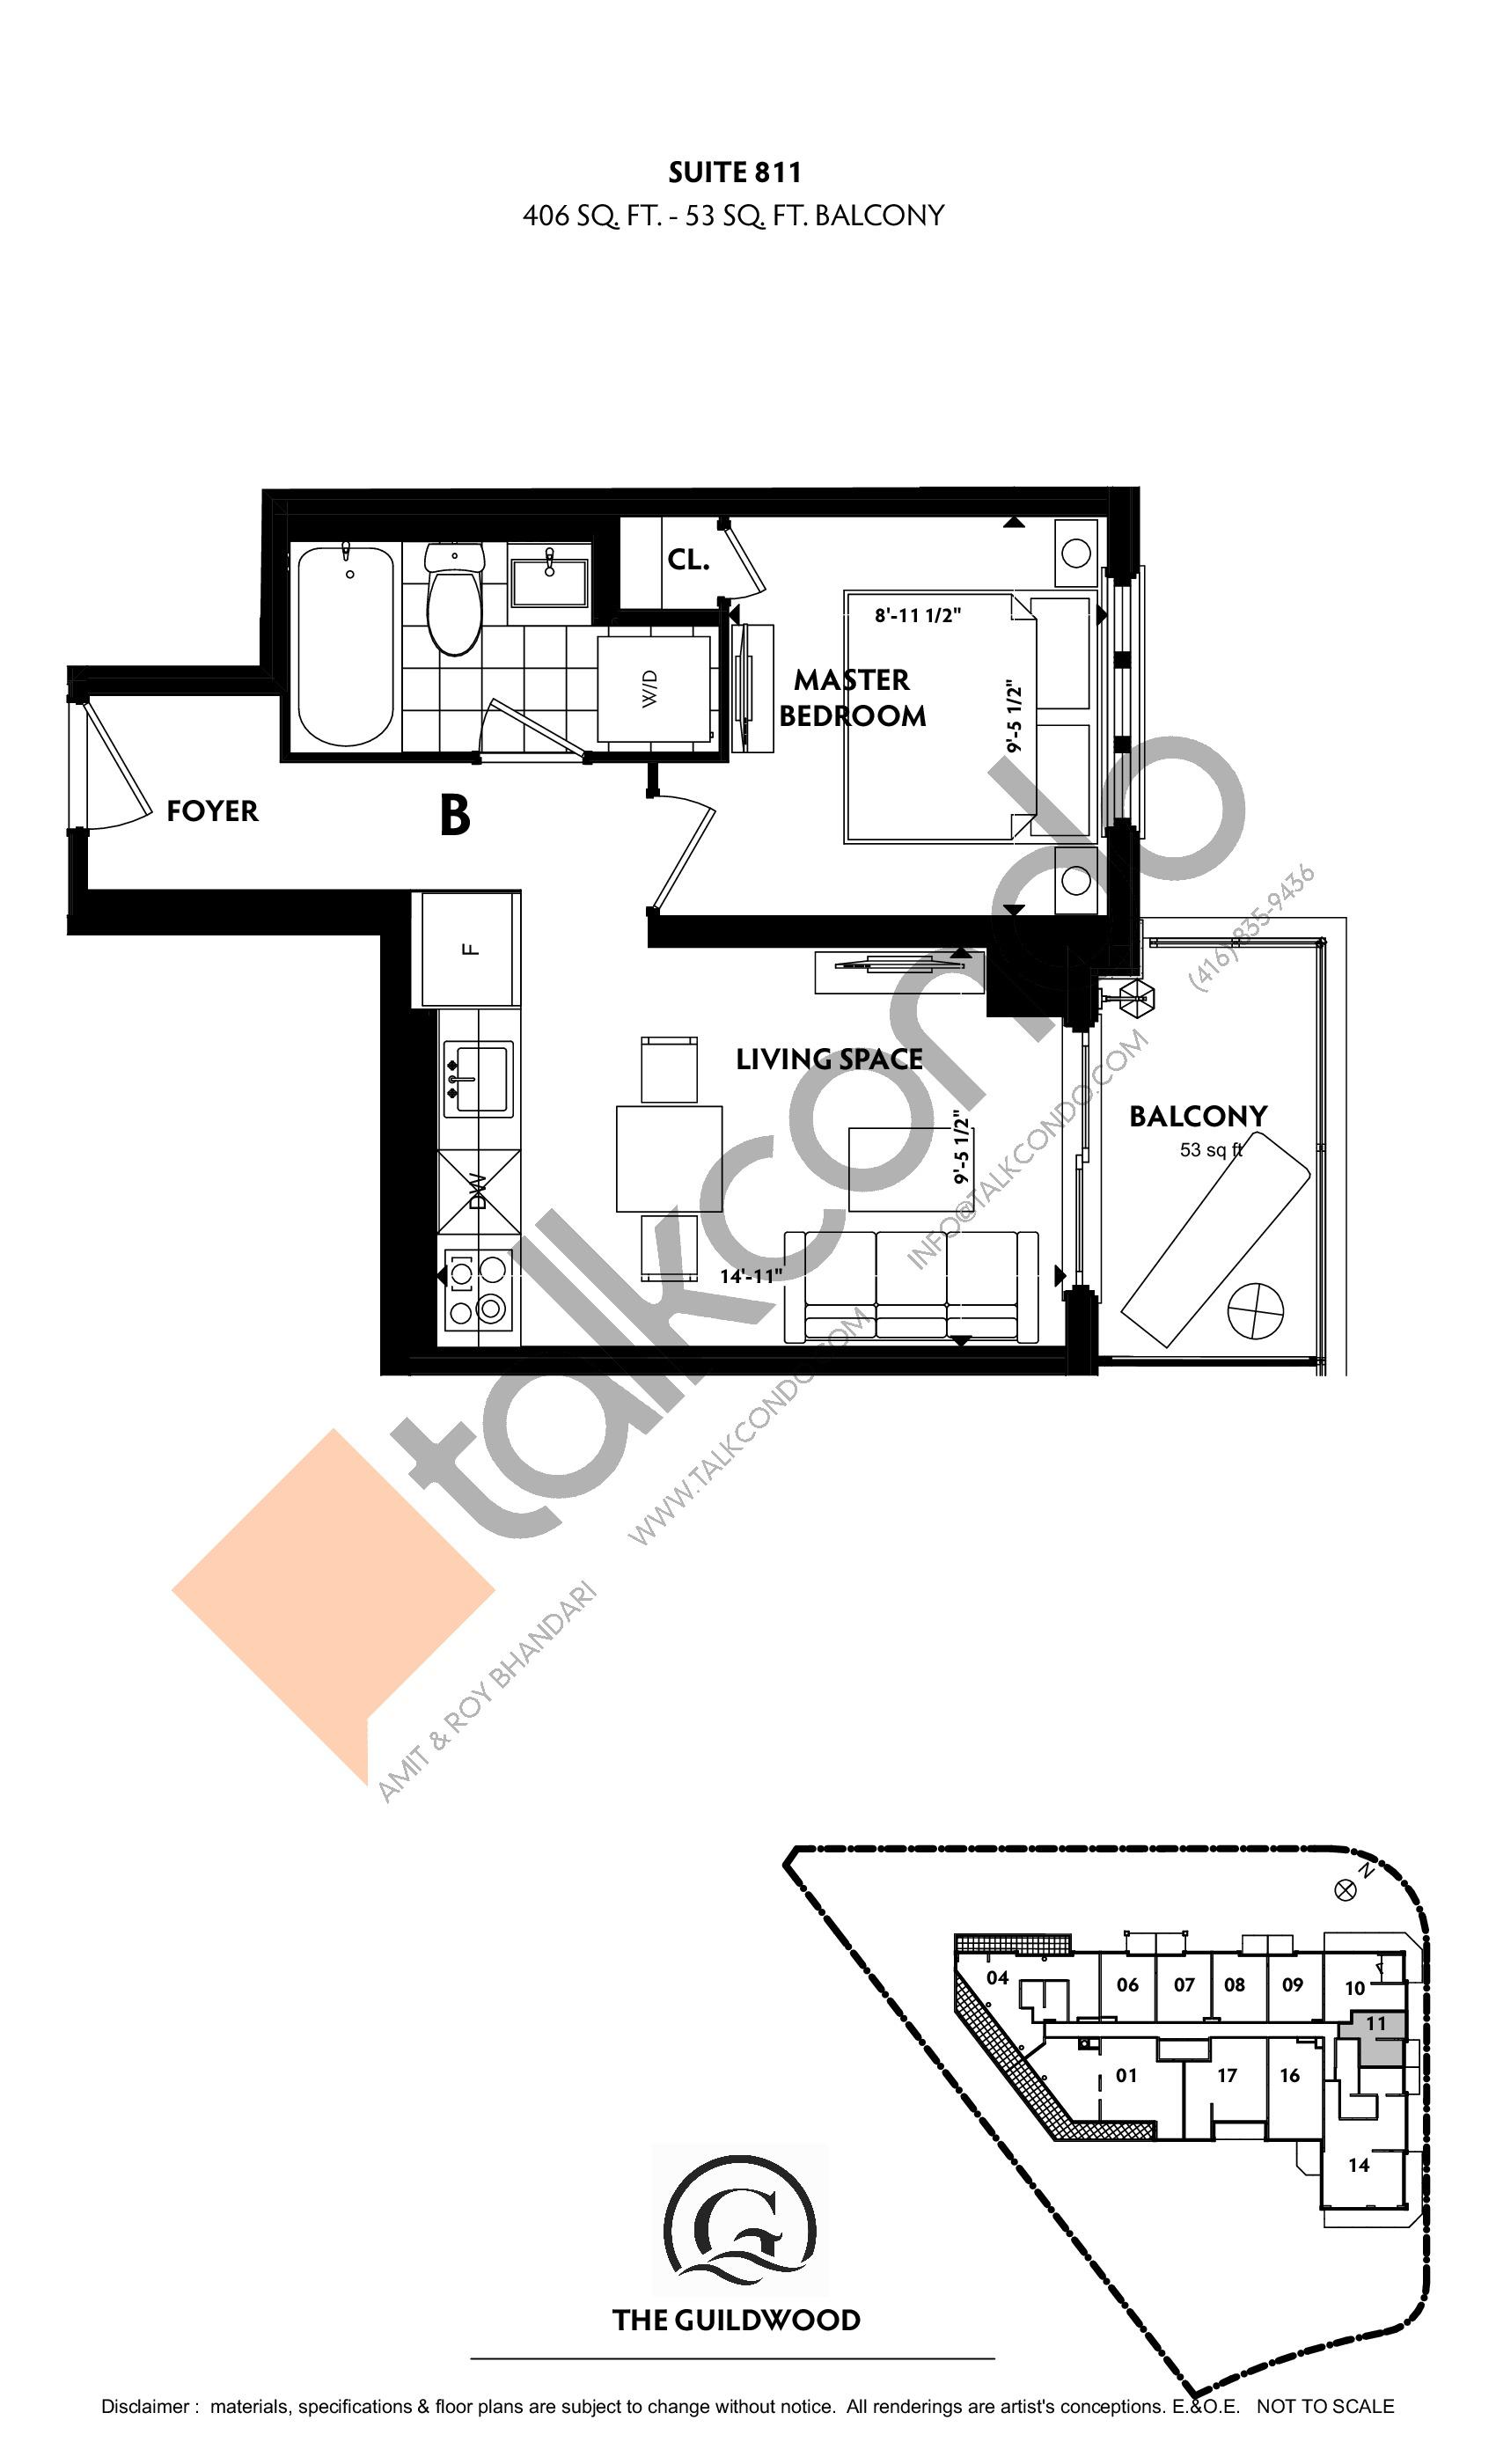 Suite 811 Floor Plan at Guildwood Condos - 406 sq.ft